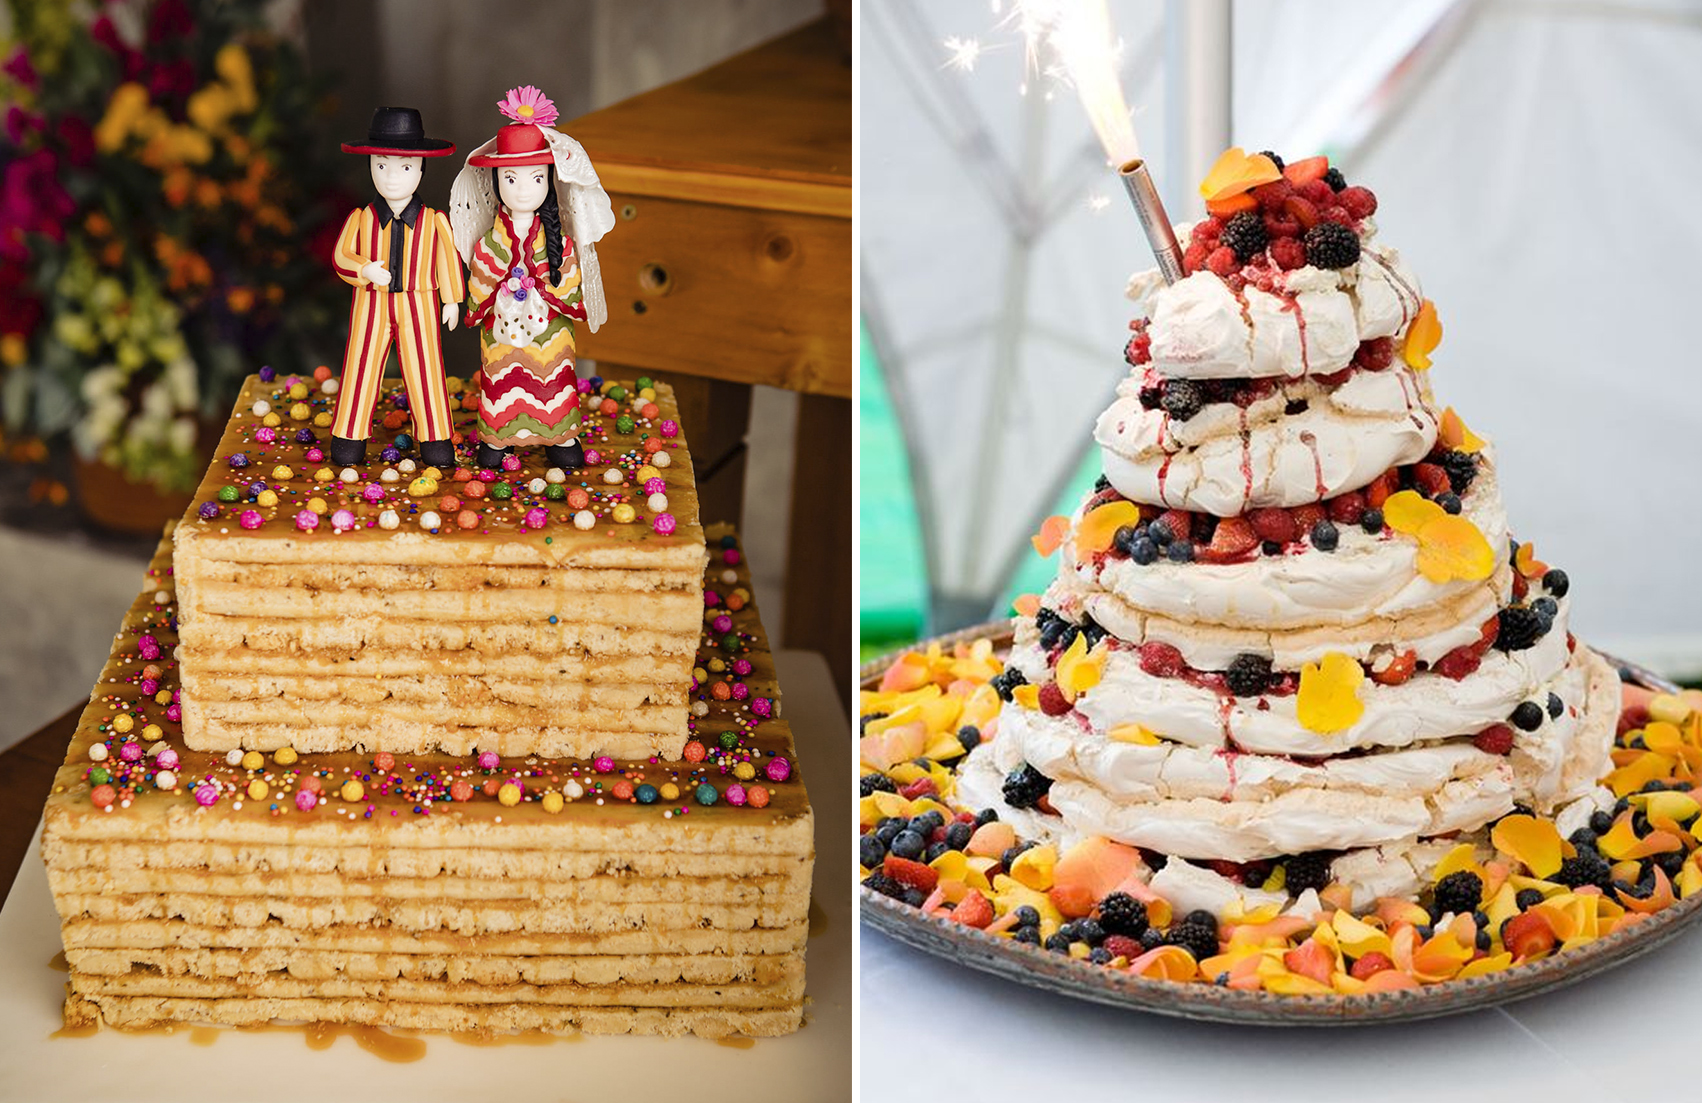 Turron wedding cake